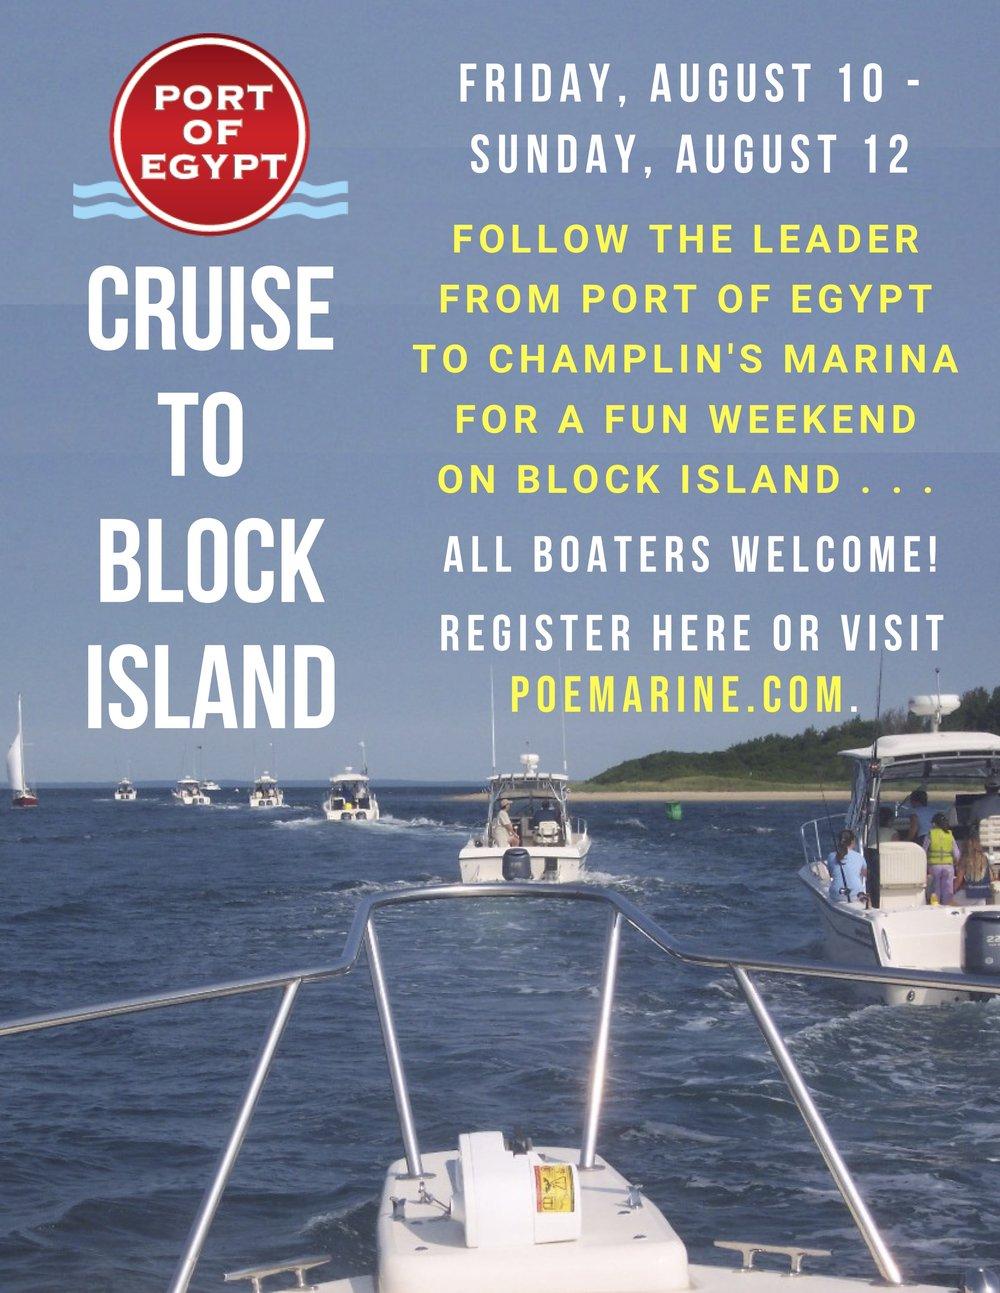 POE Cruise to Block revised 7-15-18.jpg